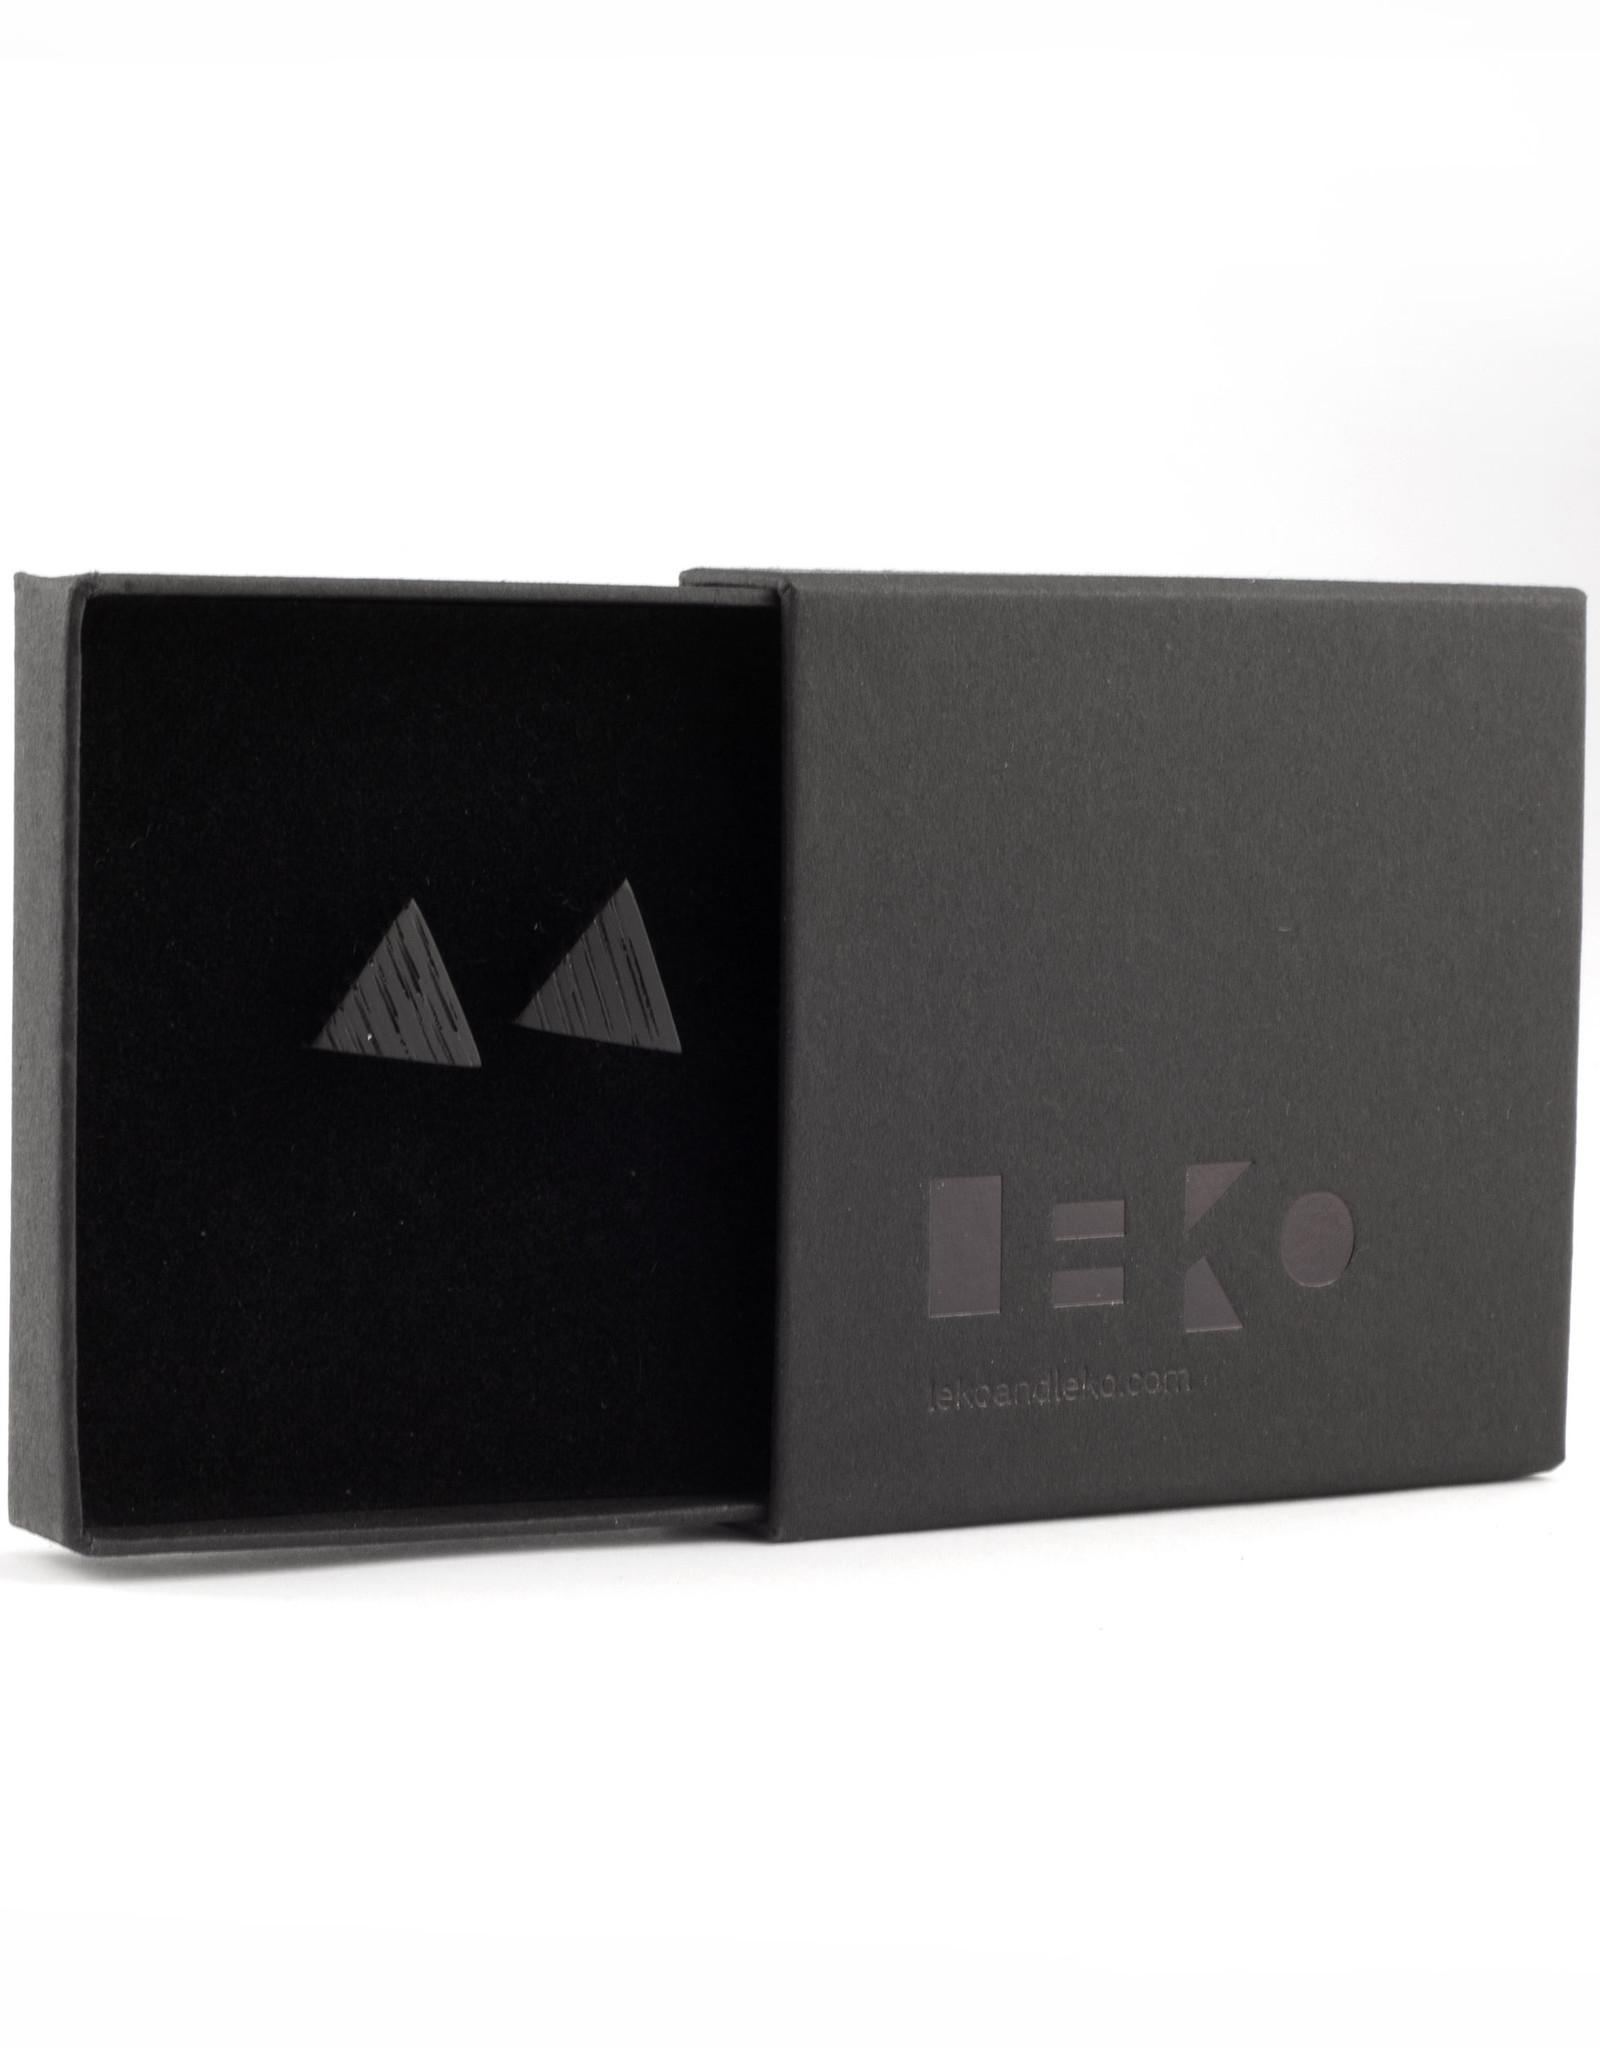 Leko & Leko Jewellery Leko & Leko - Makona Stud Earrings